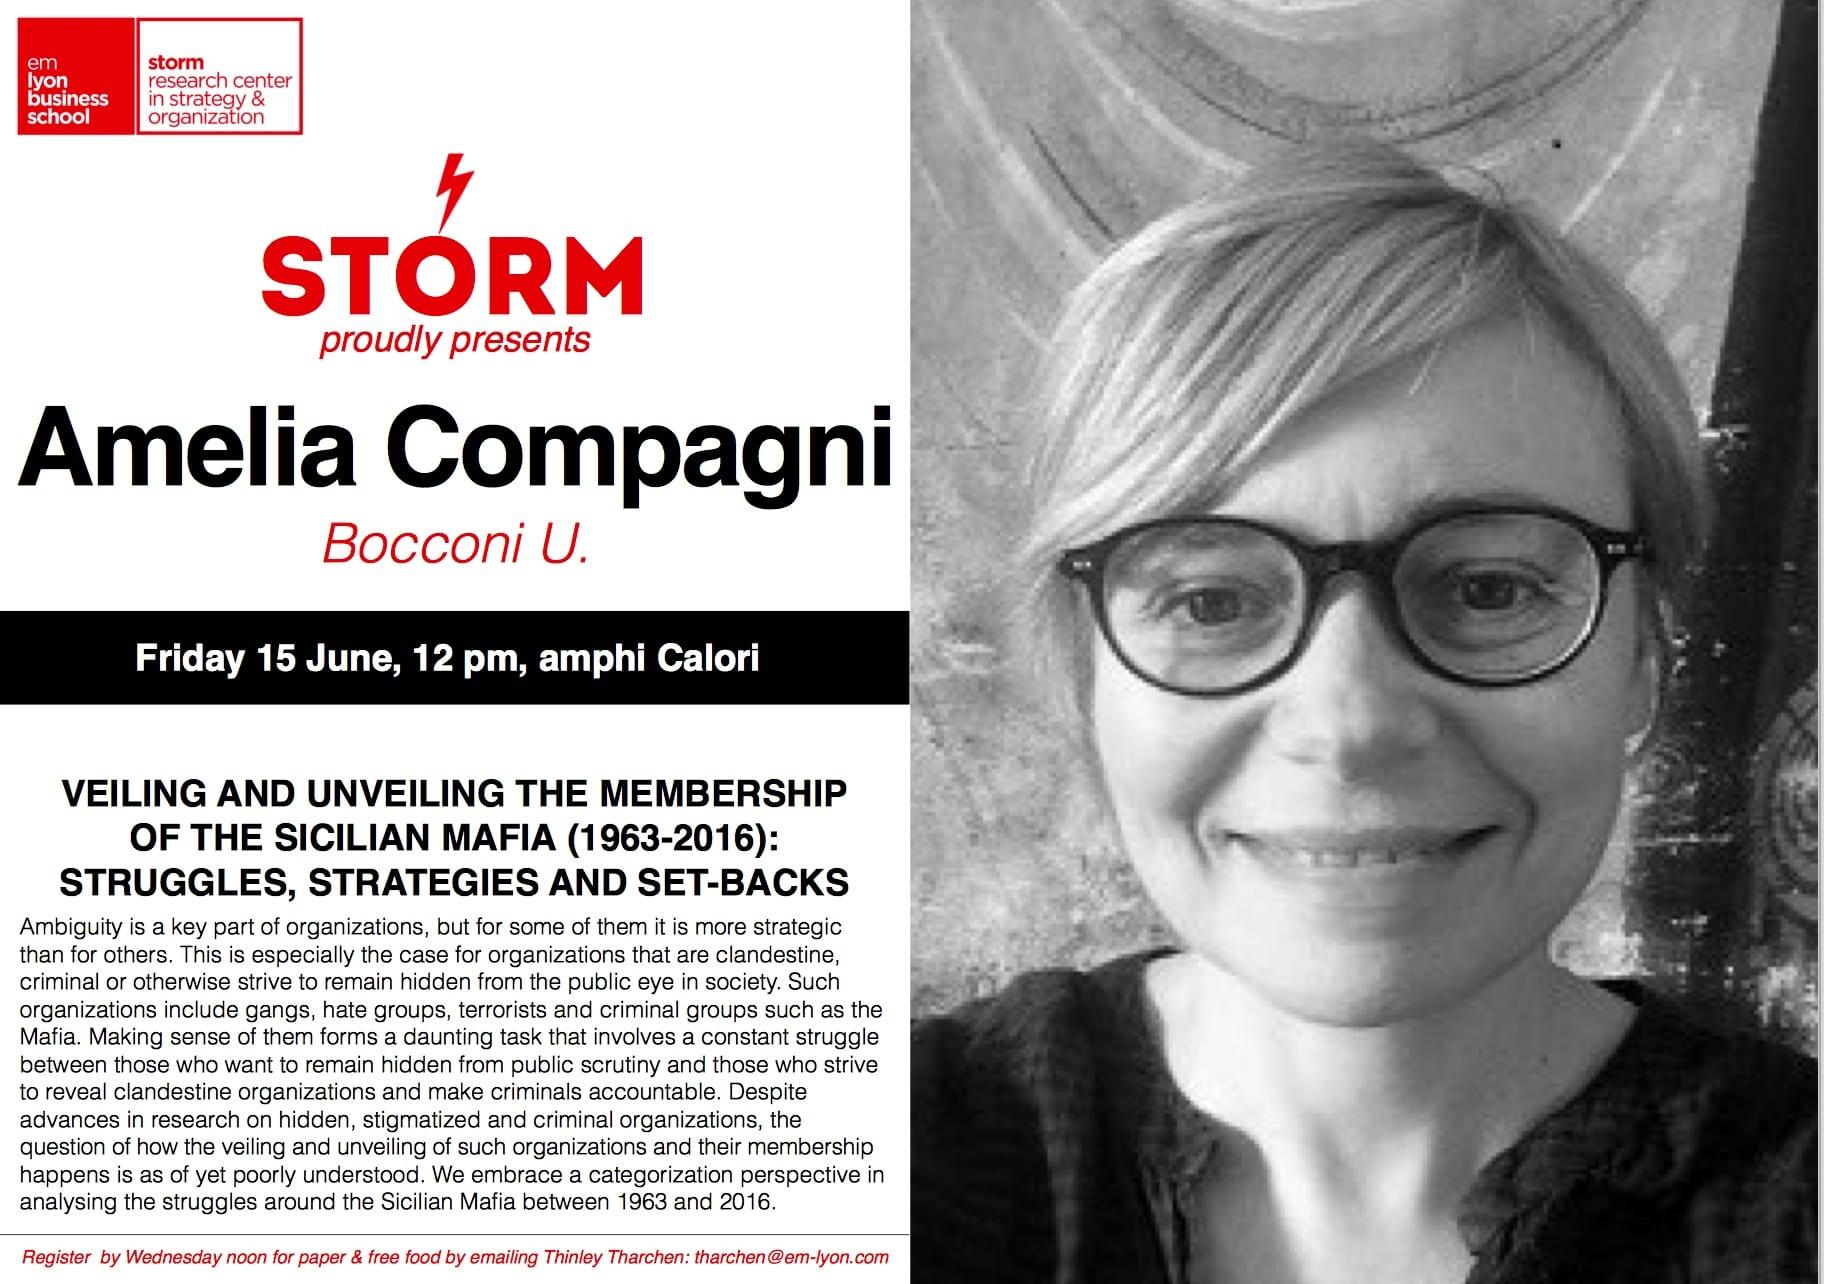 15 June 2018: AMELIA COMPAGNI (Bocconi U.)